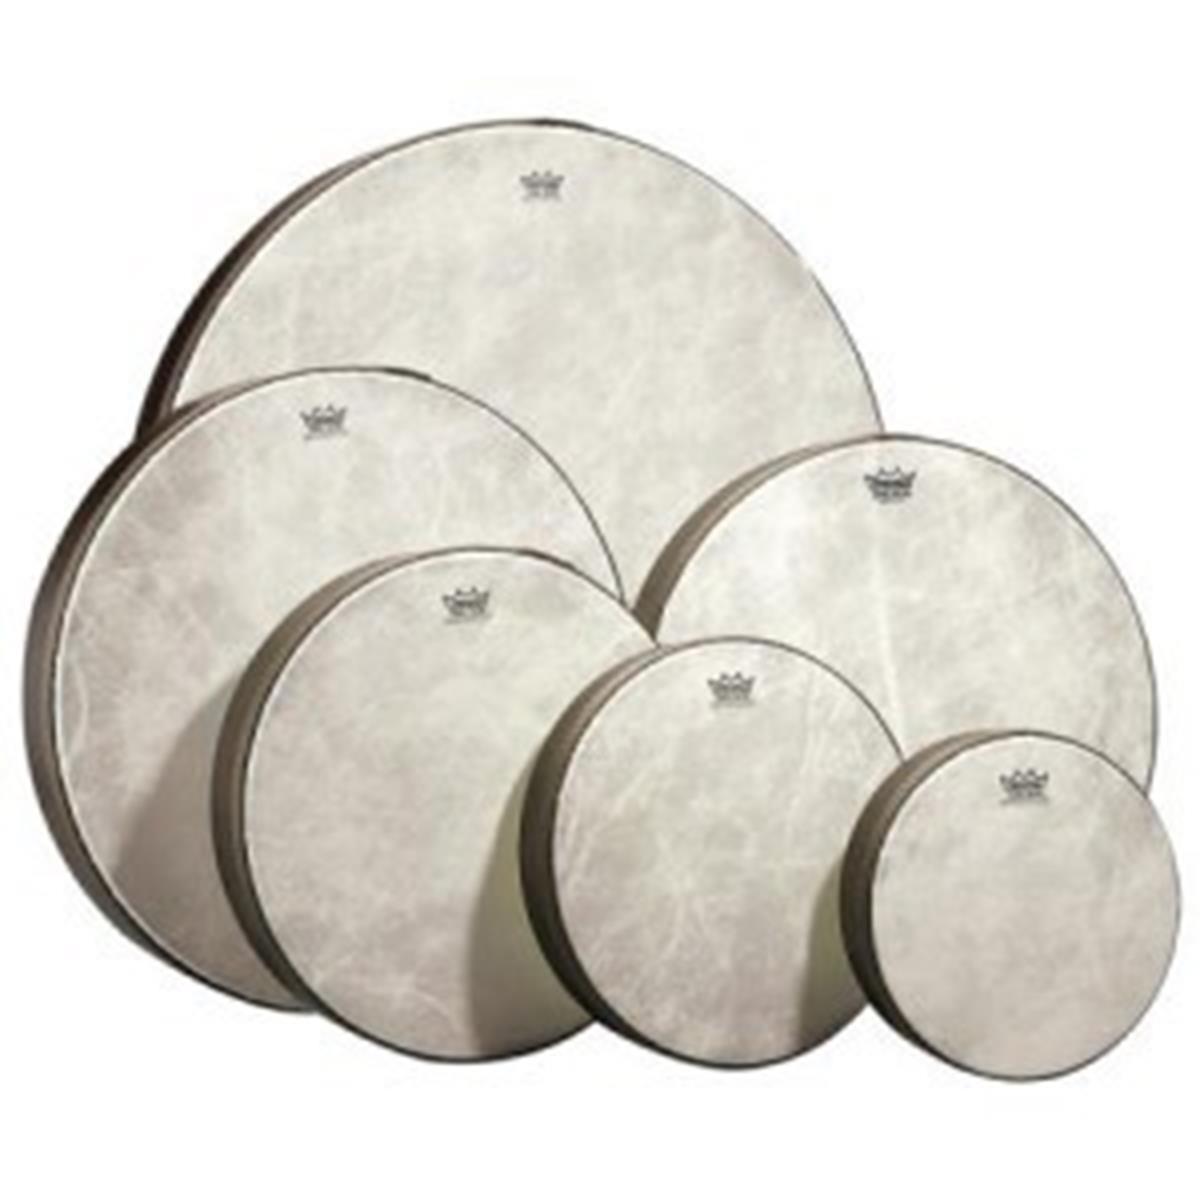 REMO Frame Drum 12 Renaissance - Batterie / Percussioni Percussioni - Varie